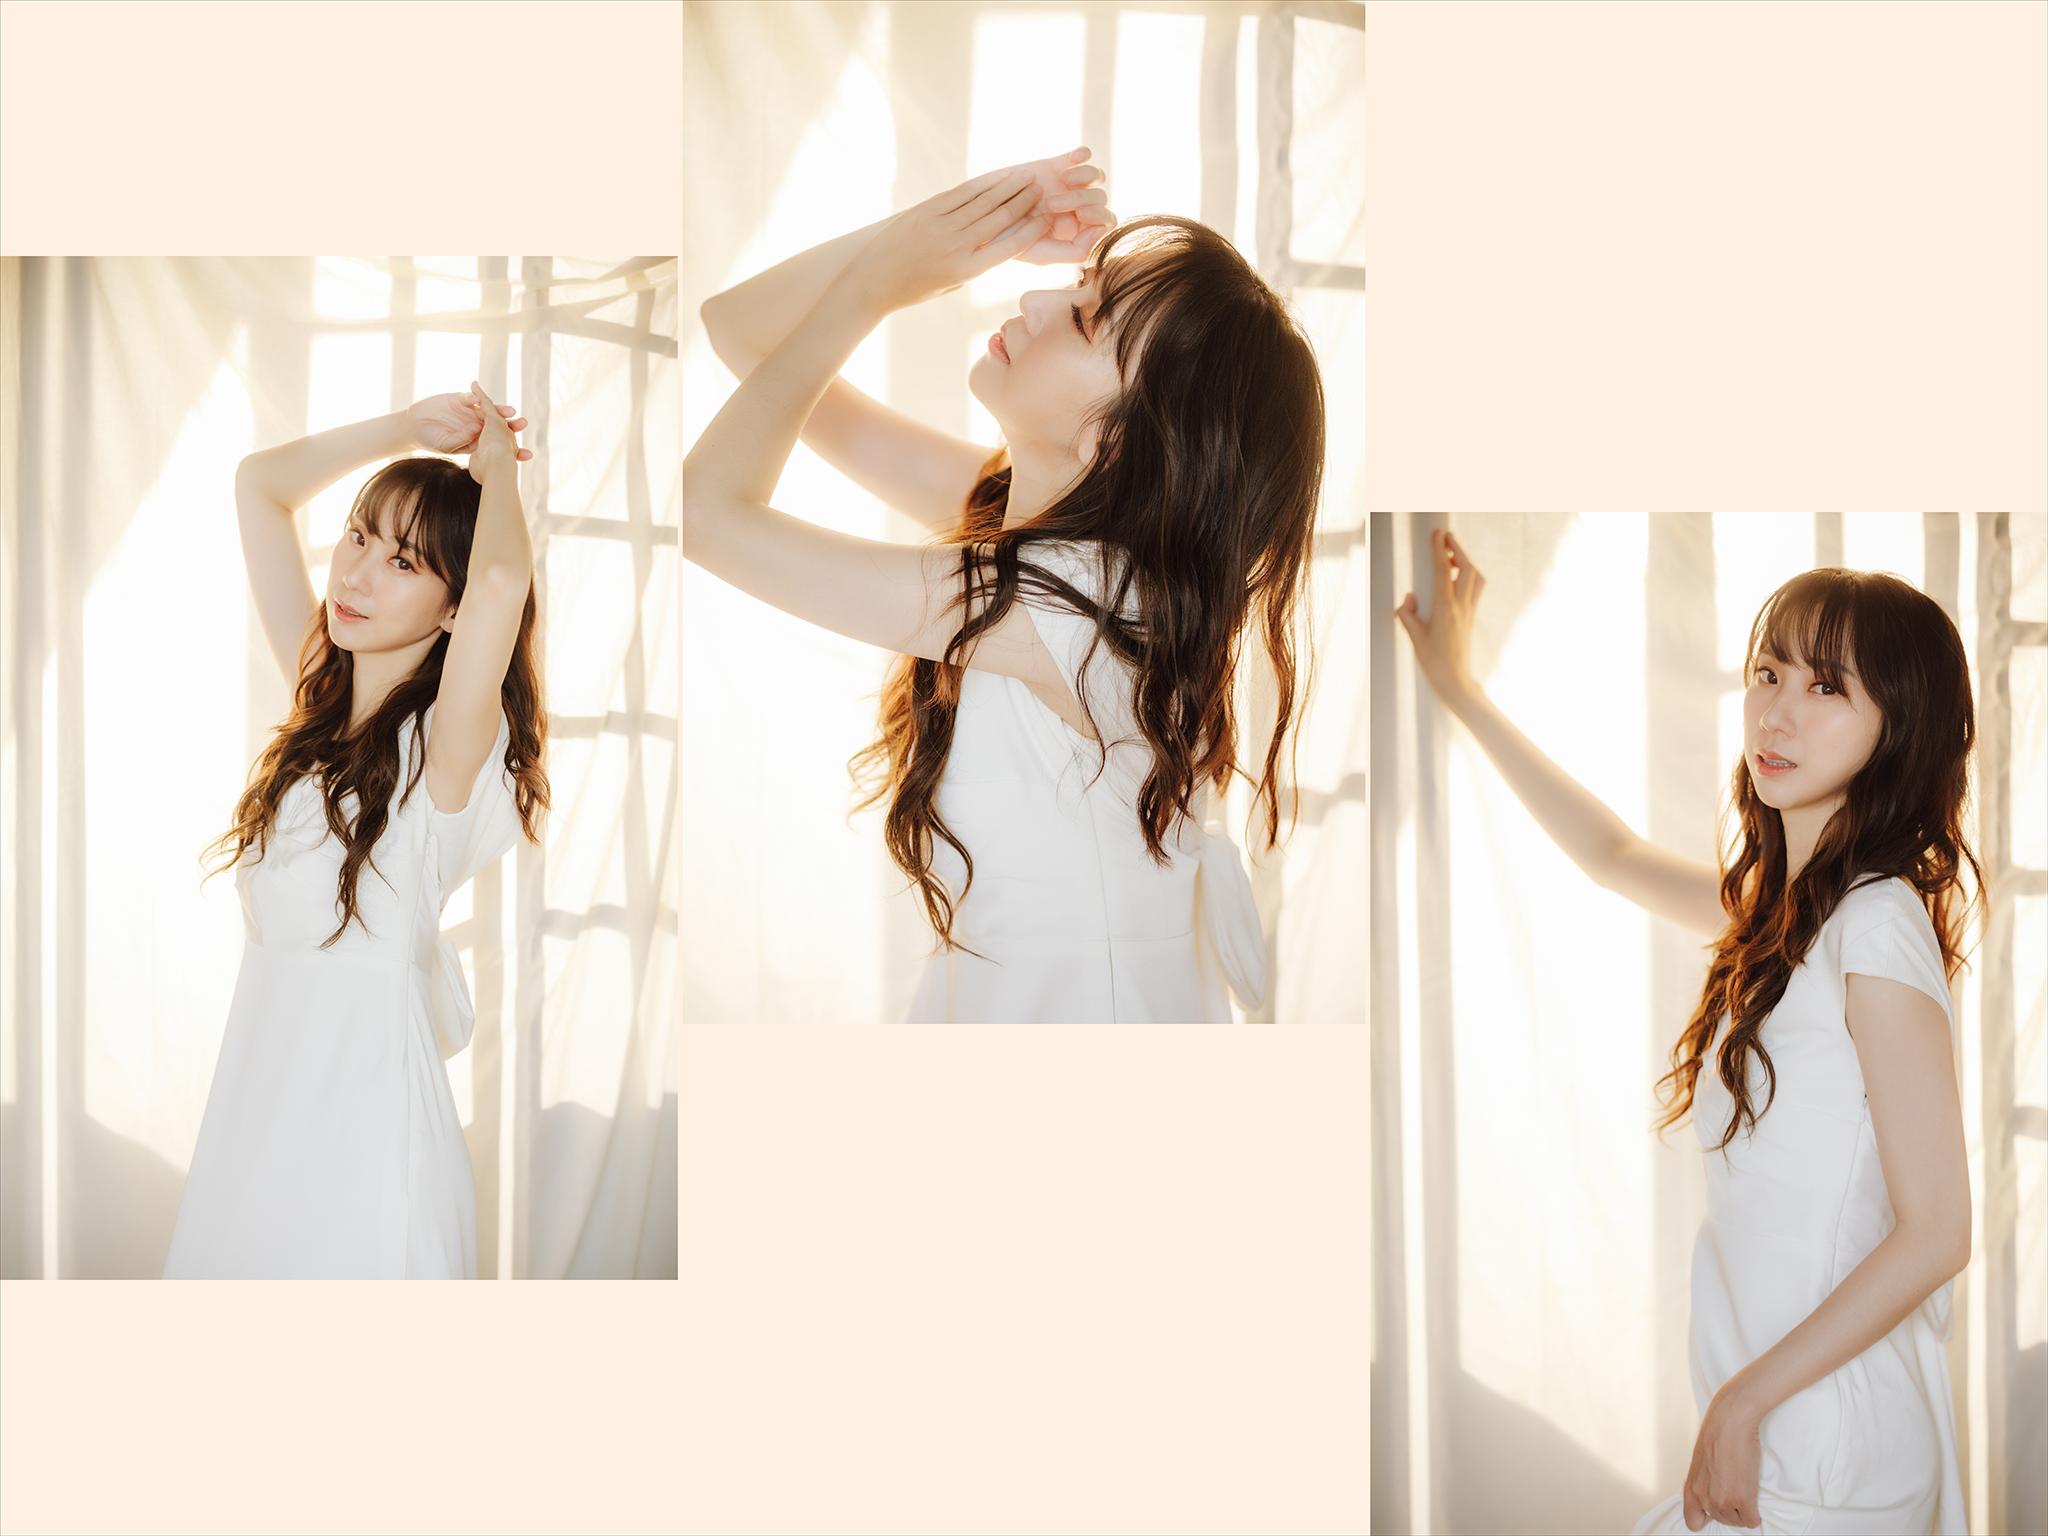 50660018276 0e02a23214 o - 【自主婚紗】+Melody+